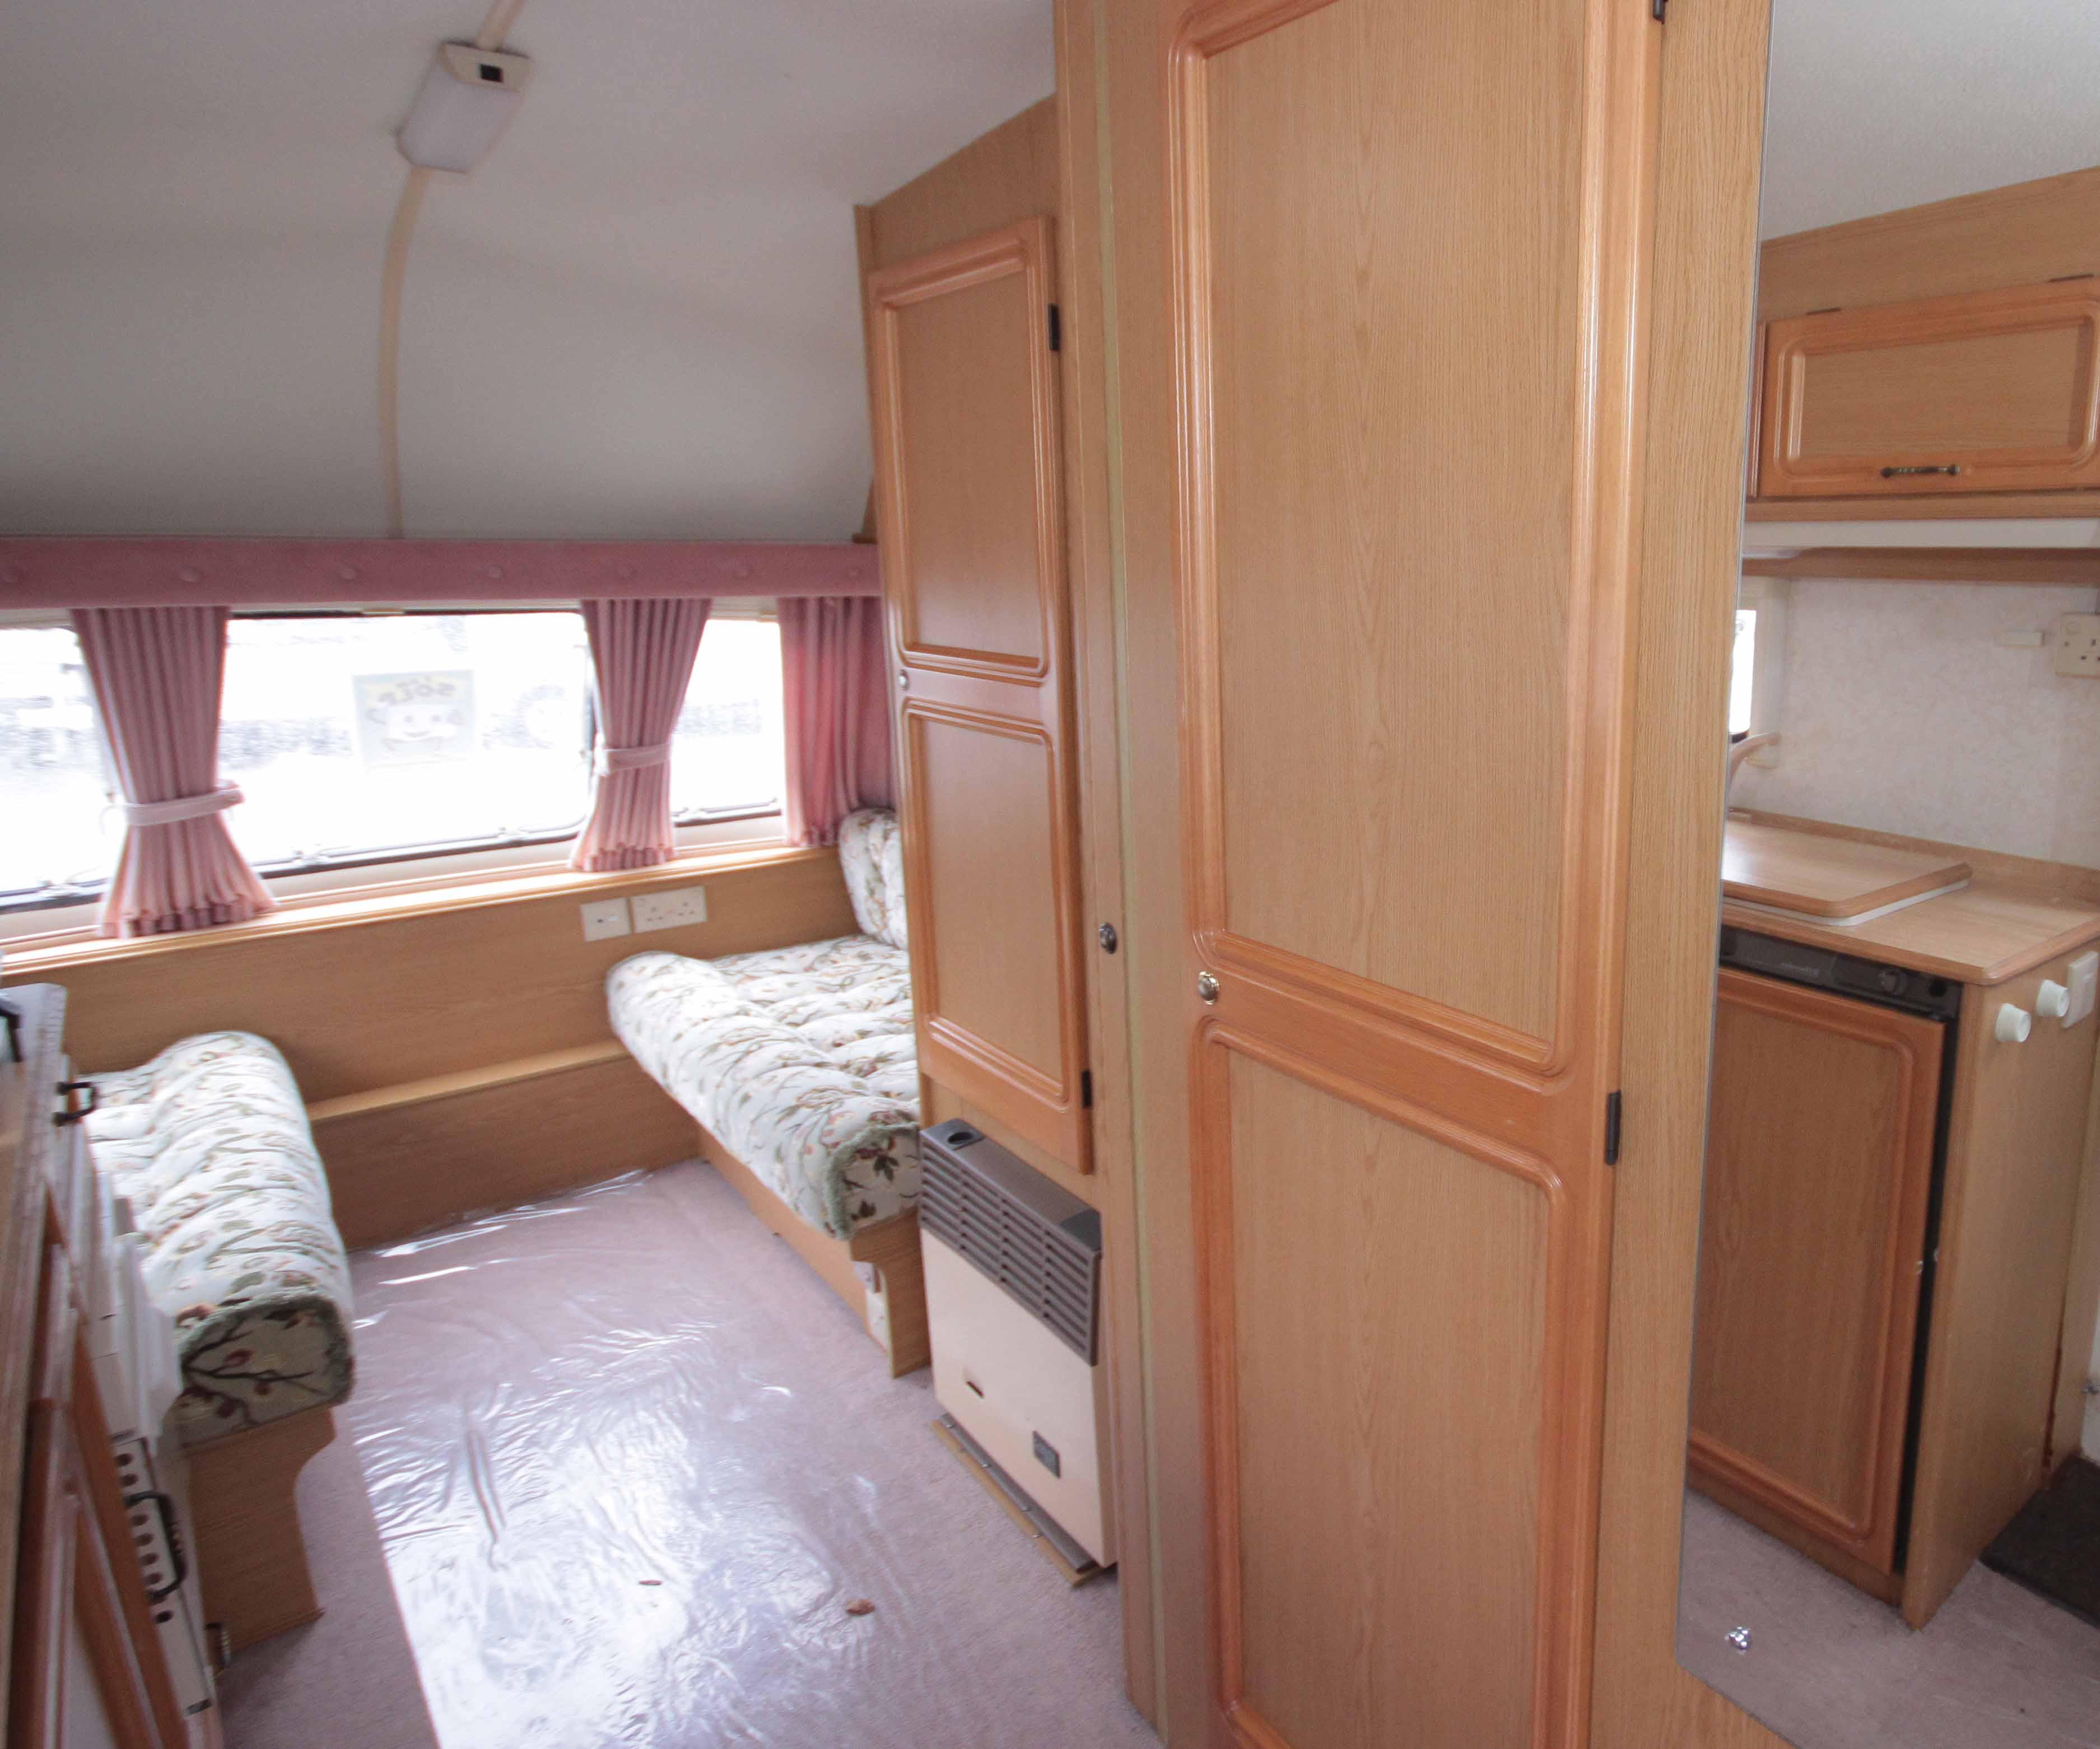 Kina Campers 6 4/5 berth (small) ABI Jubilee GT Envoy